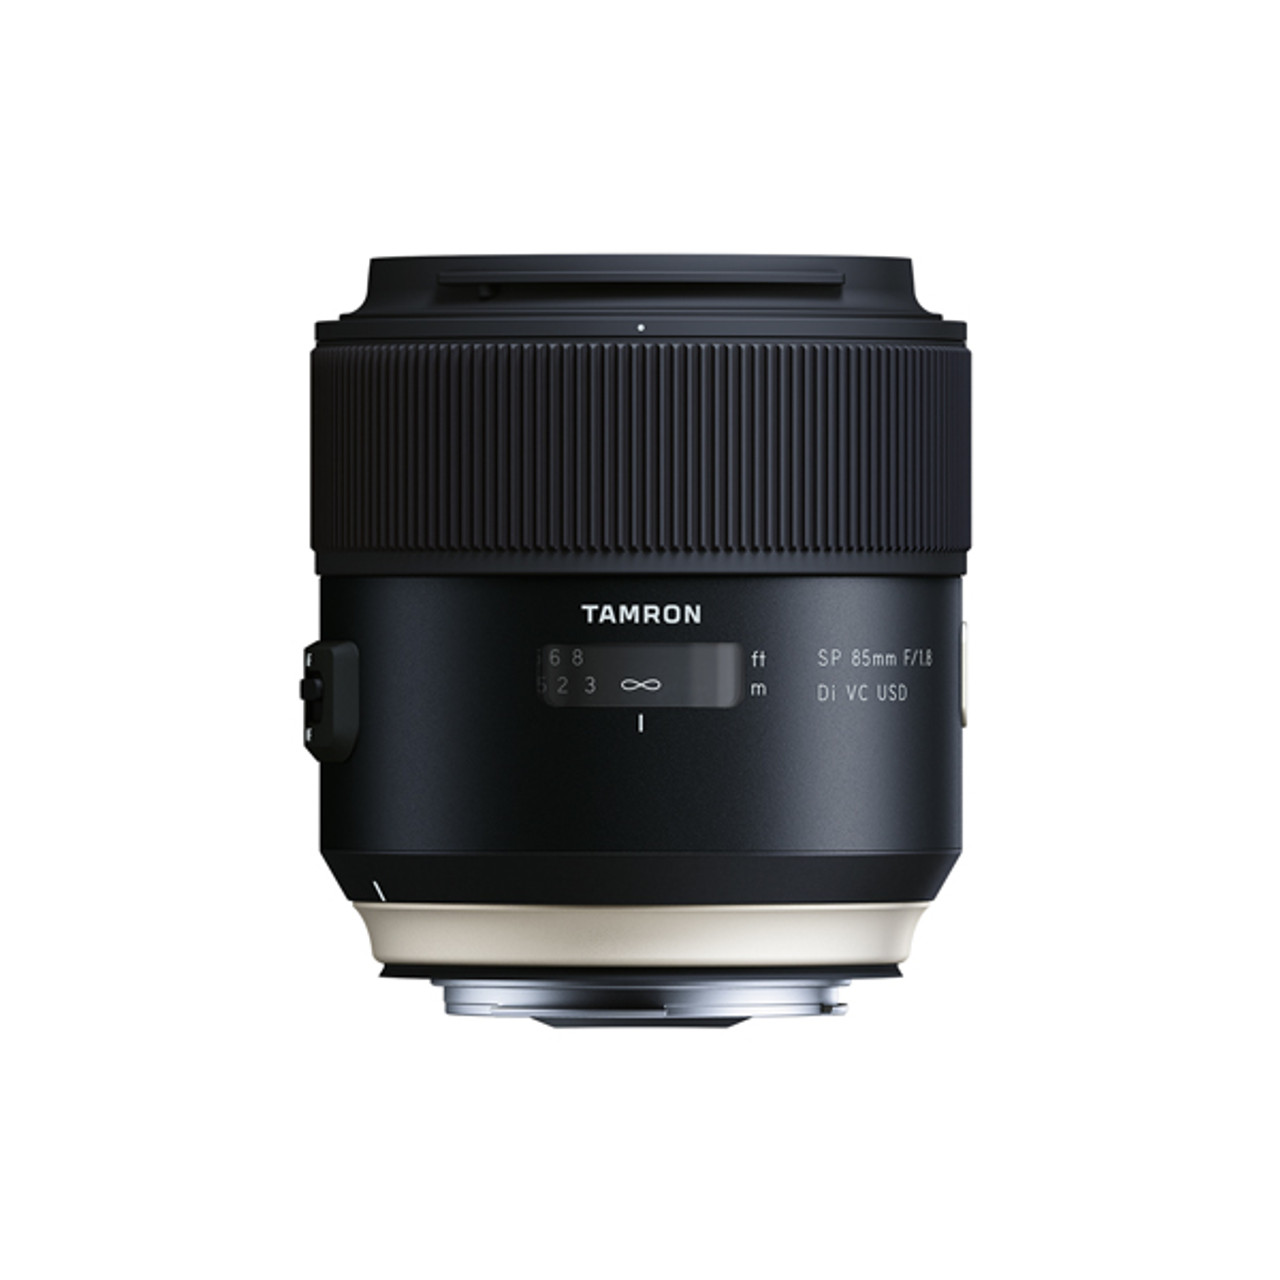 Tamron 85mm F1.8 Di VC USD Nikon